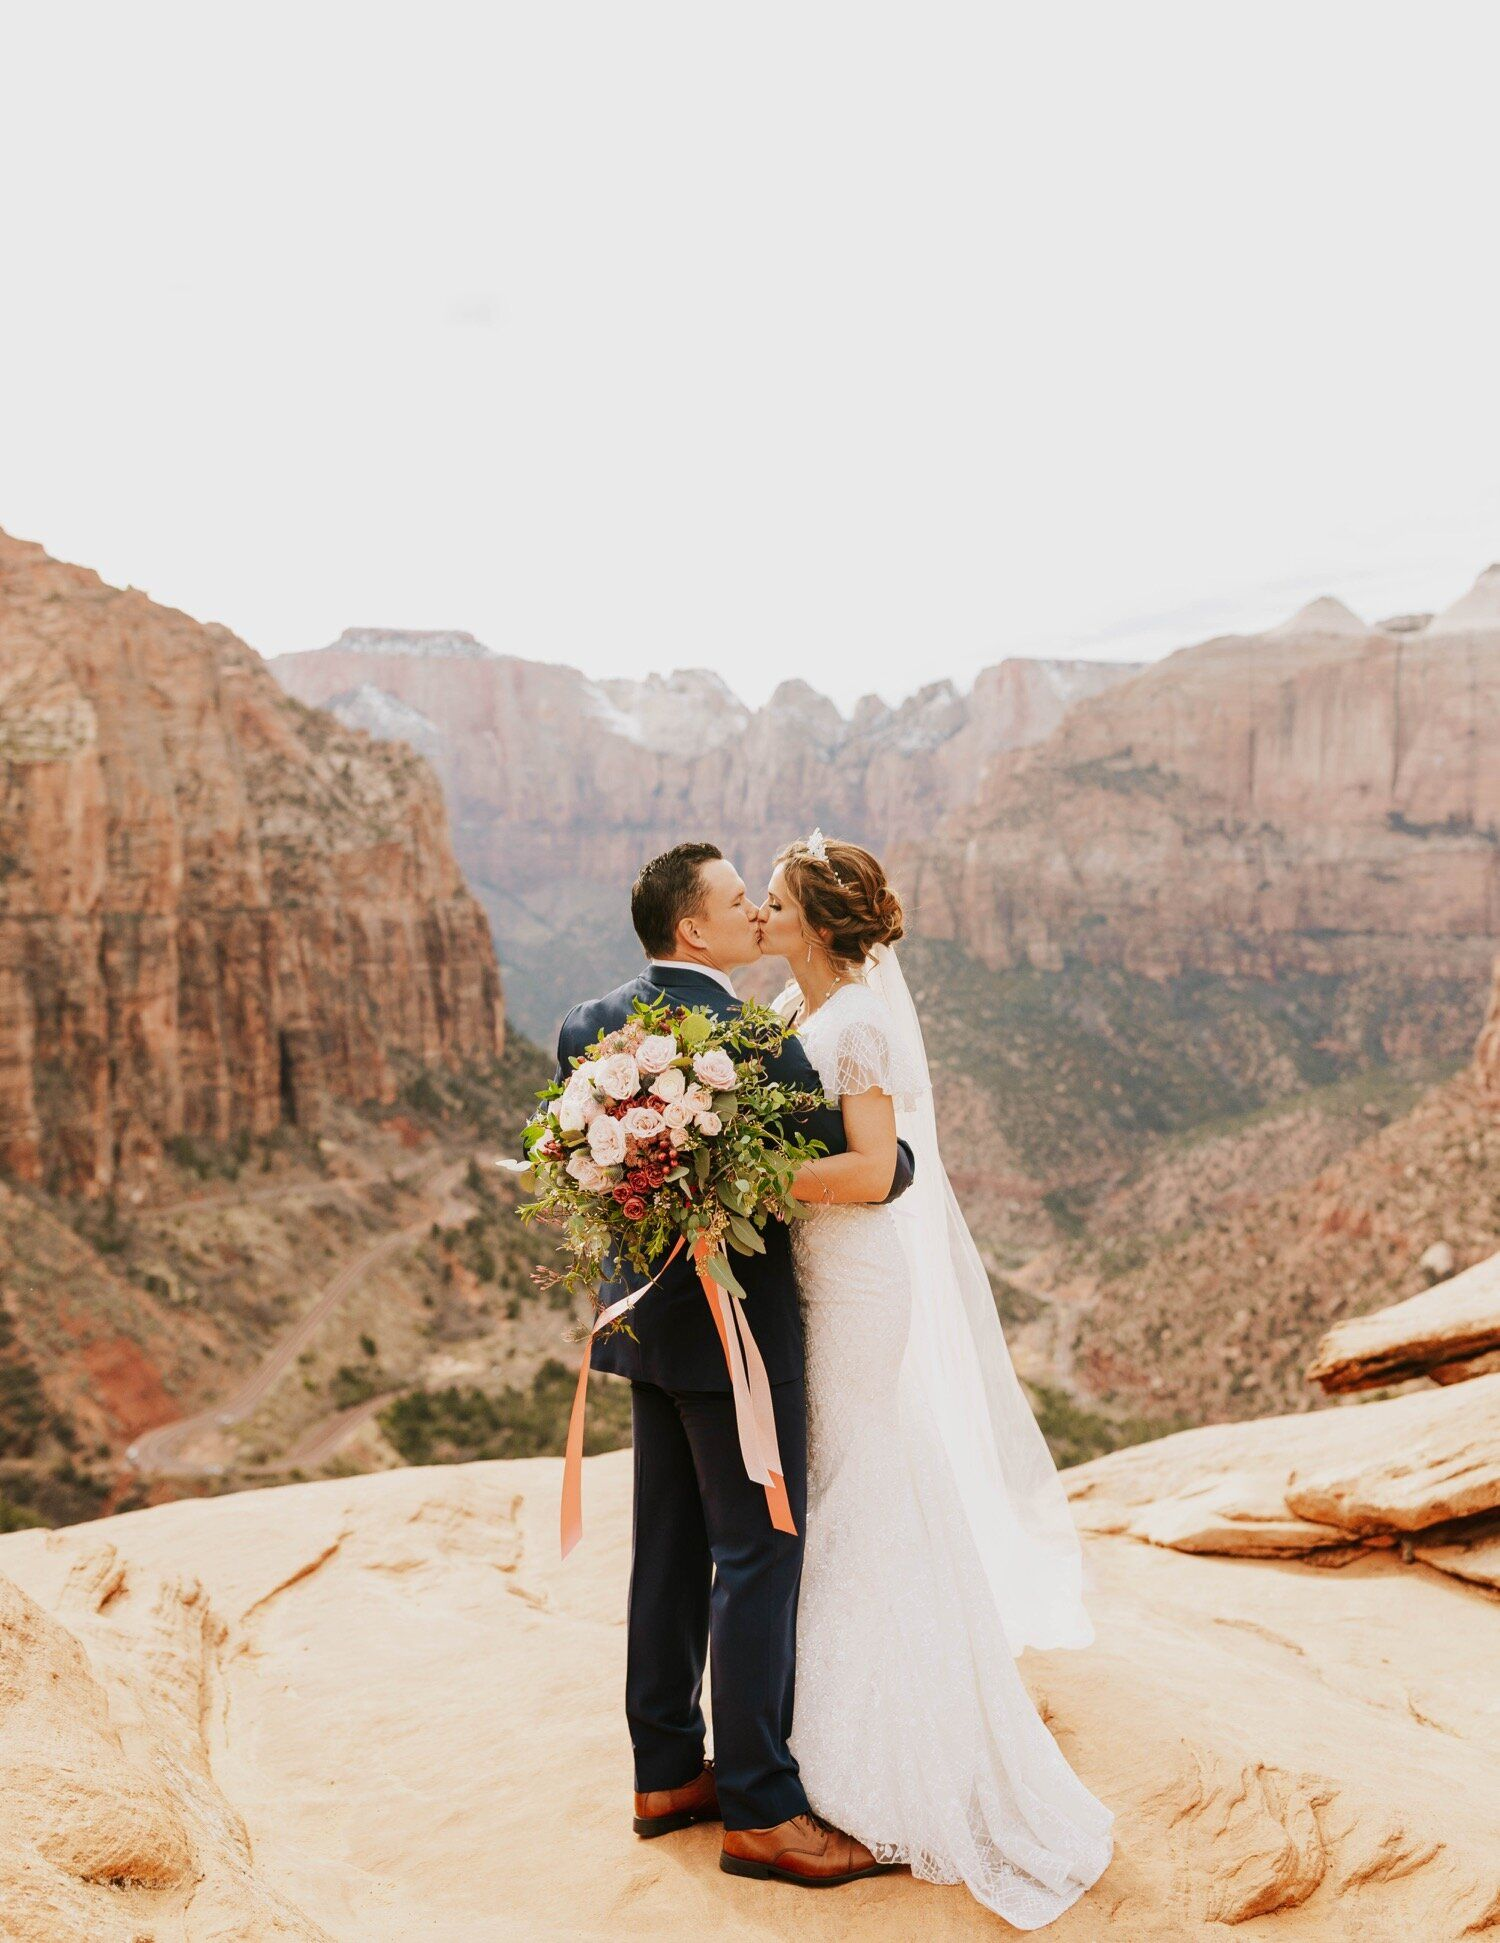 Zion National Park Wedding Portraits Jessa E Photographs In 2020 Utah Wedding Photographers National Park Wedding Wedding Portraits